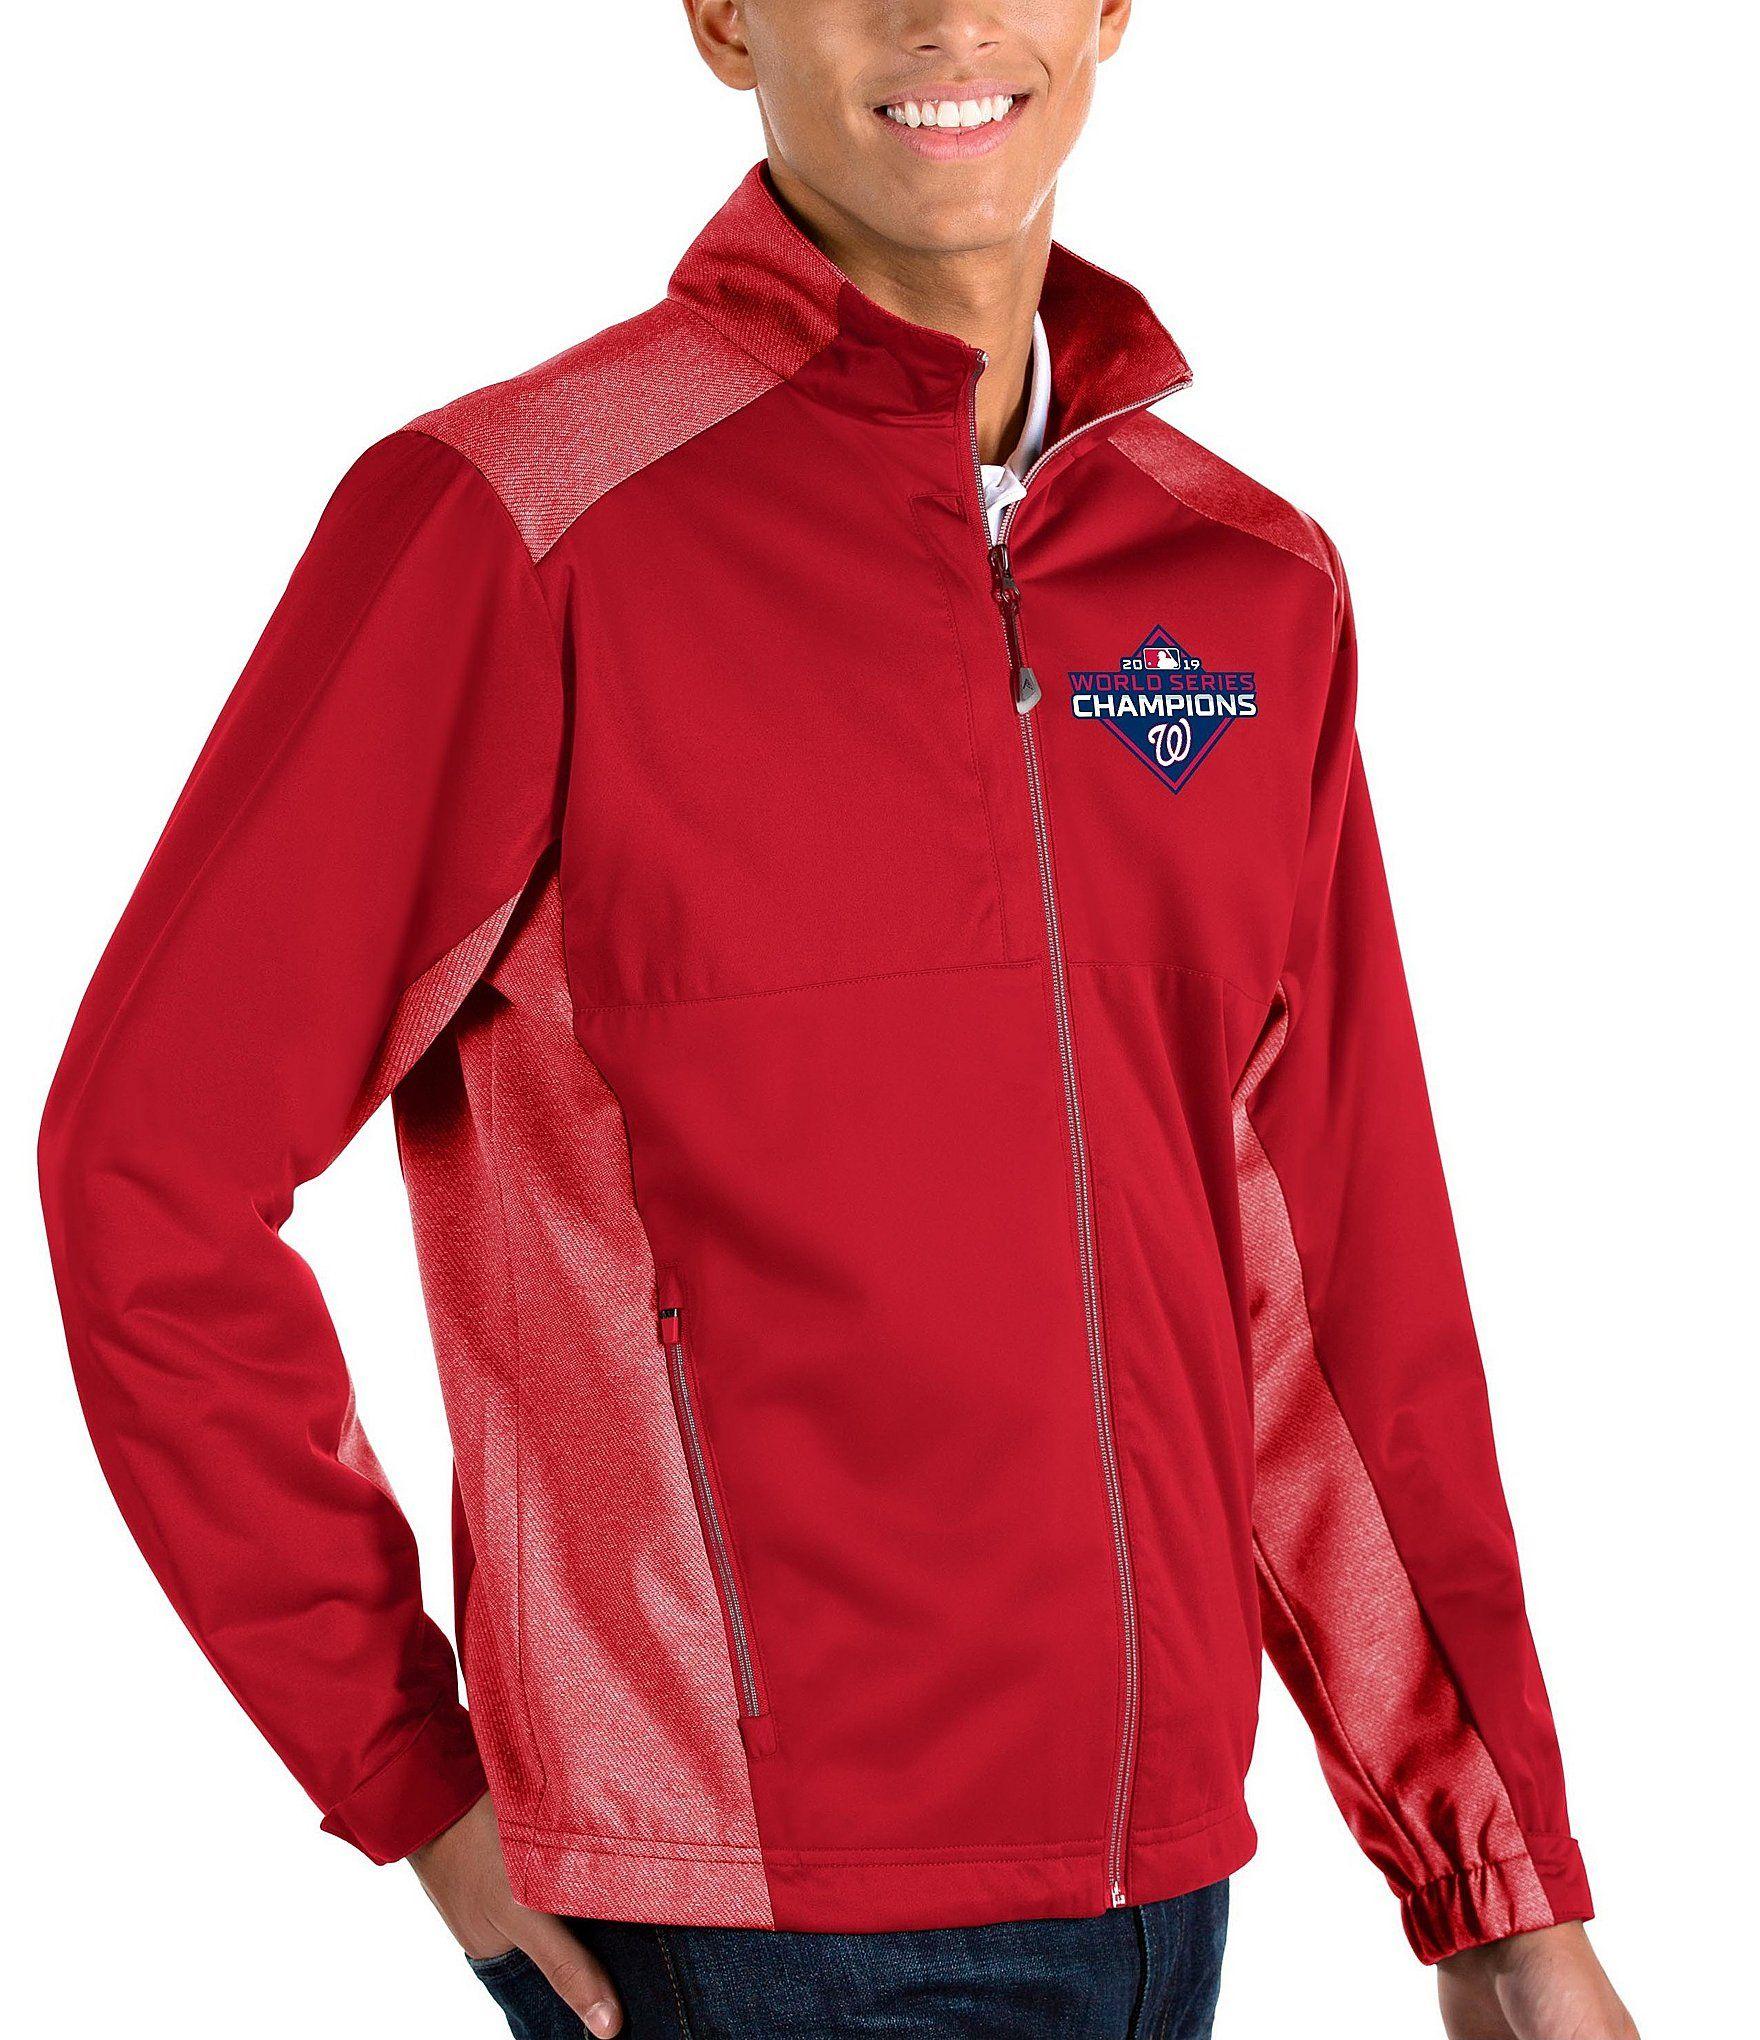 Antigua MLB World Champions Washington Nationals Revolve Full-Zip Waterproof Jacket | Dillard's